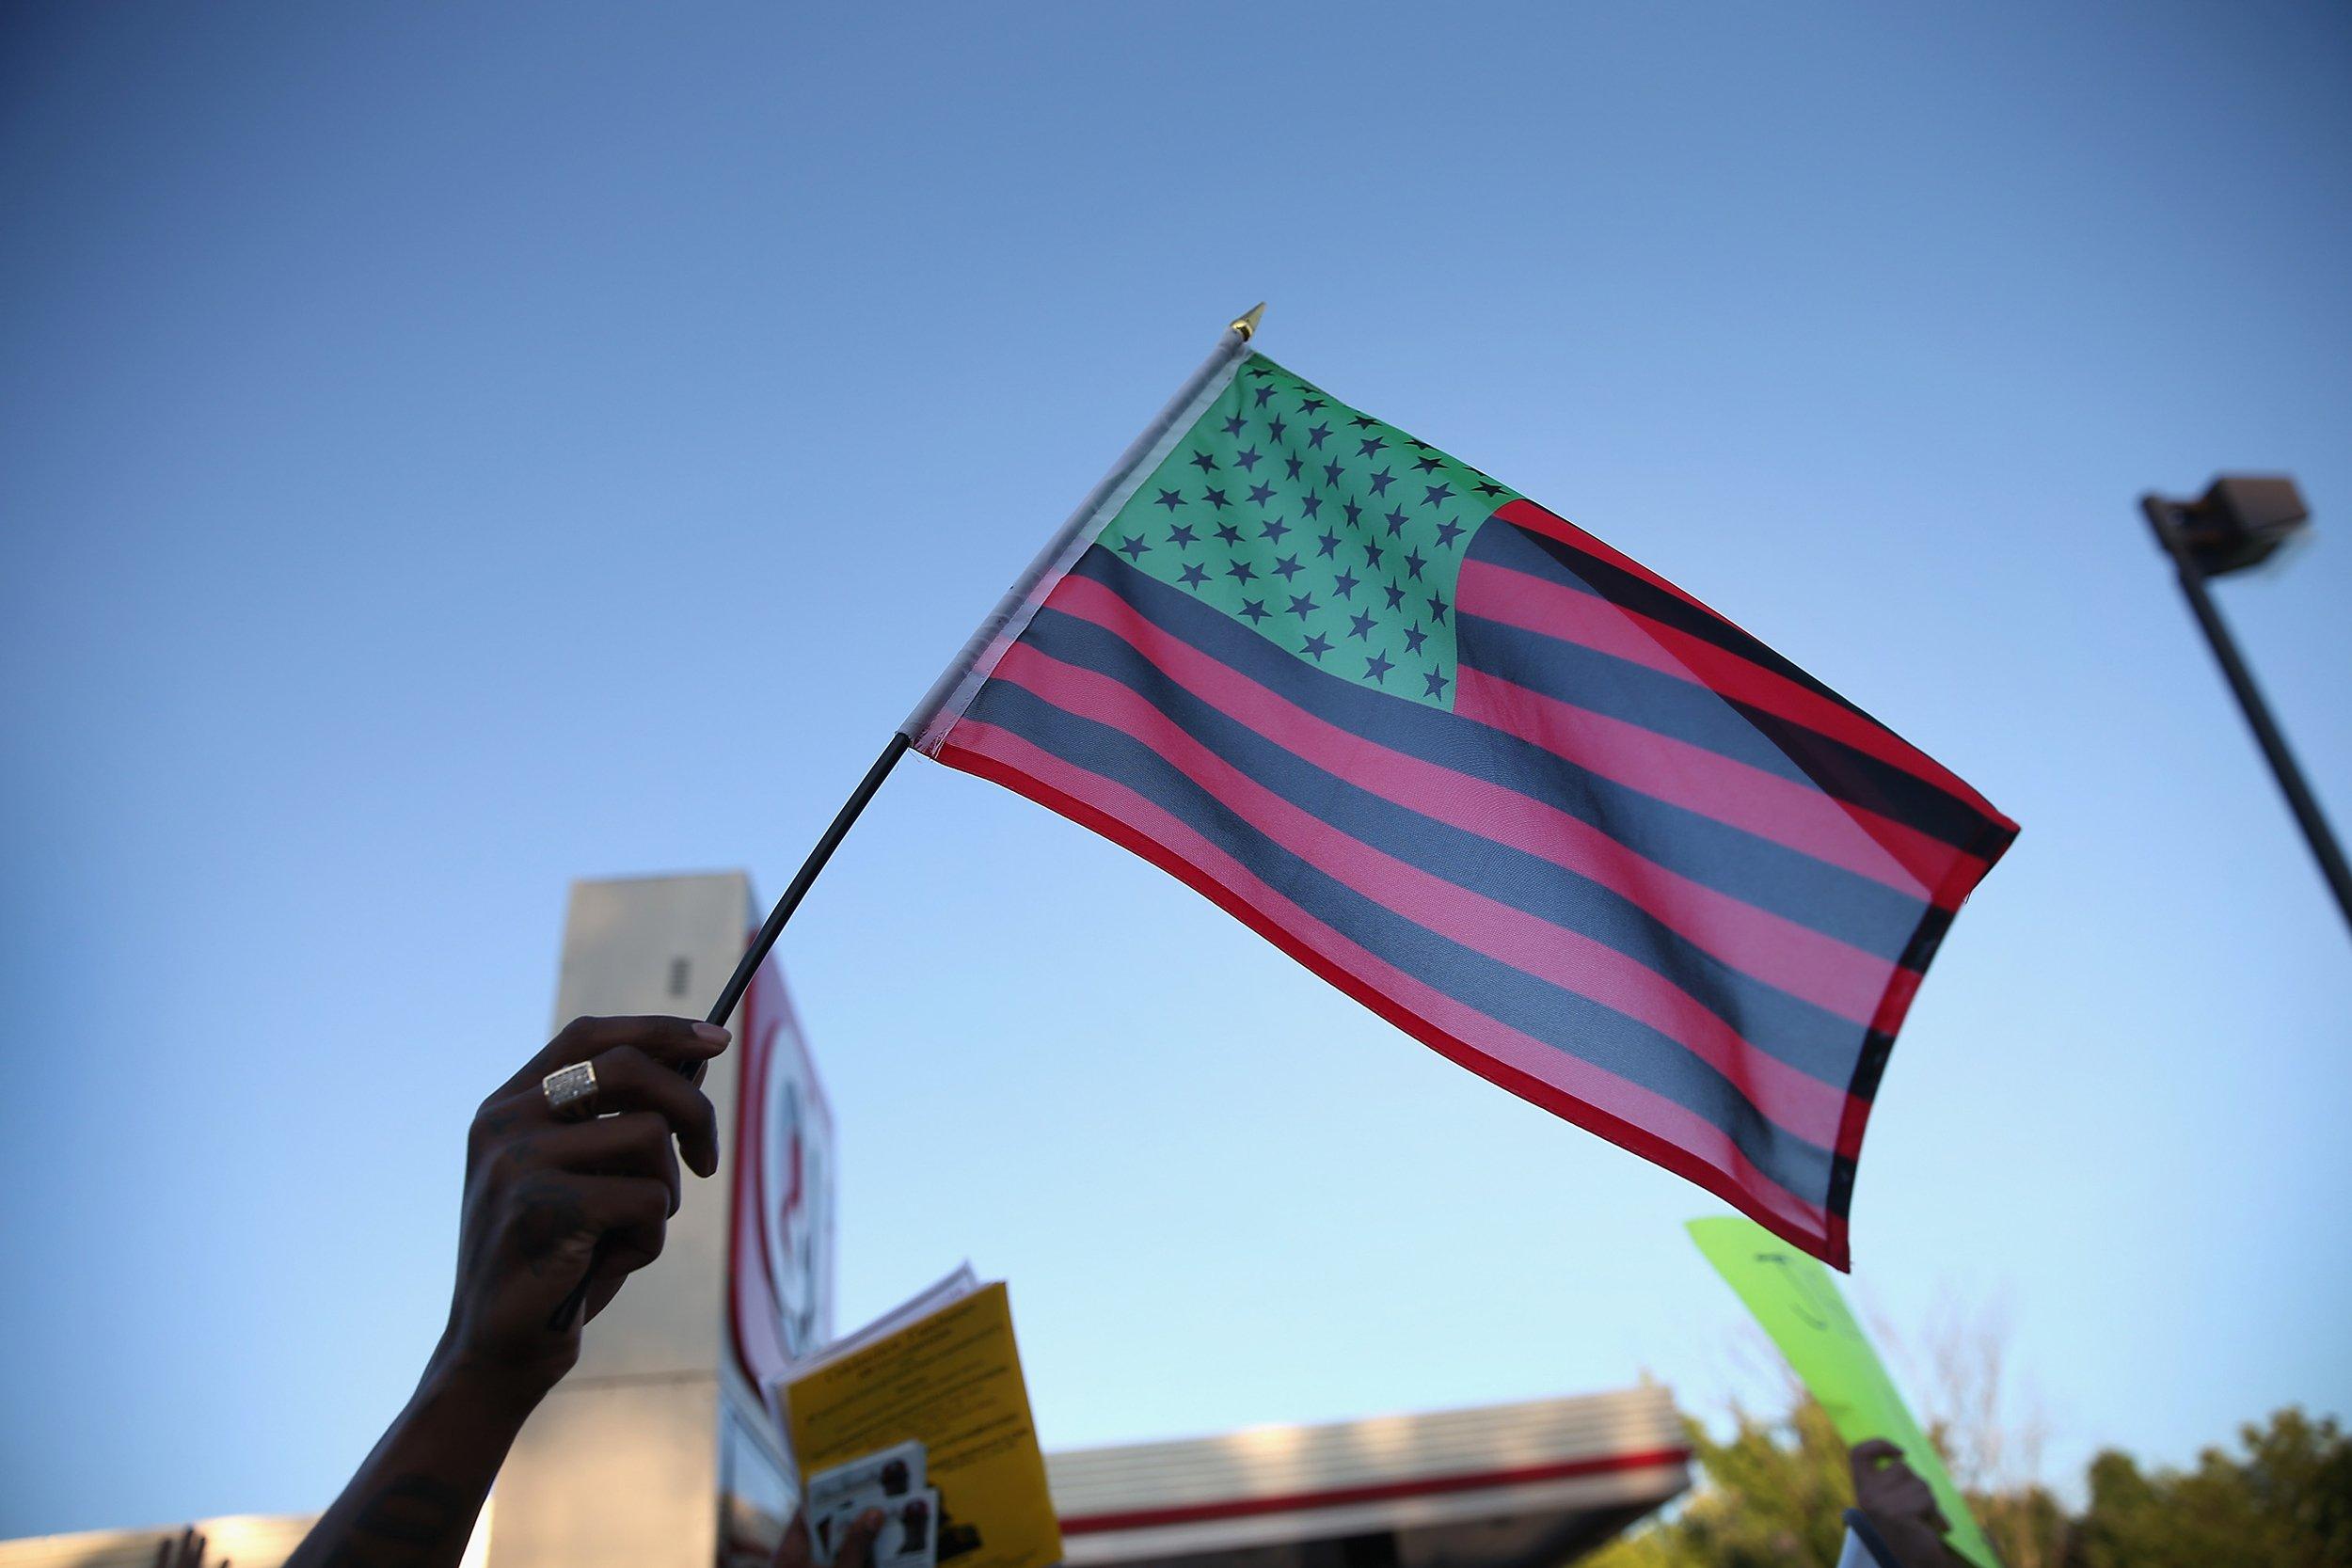 08_13_FergusonProtesting_07